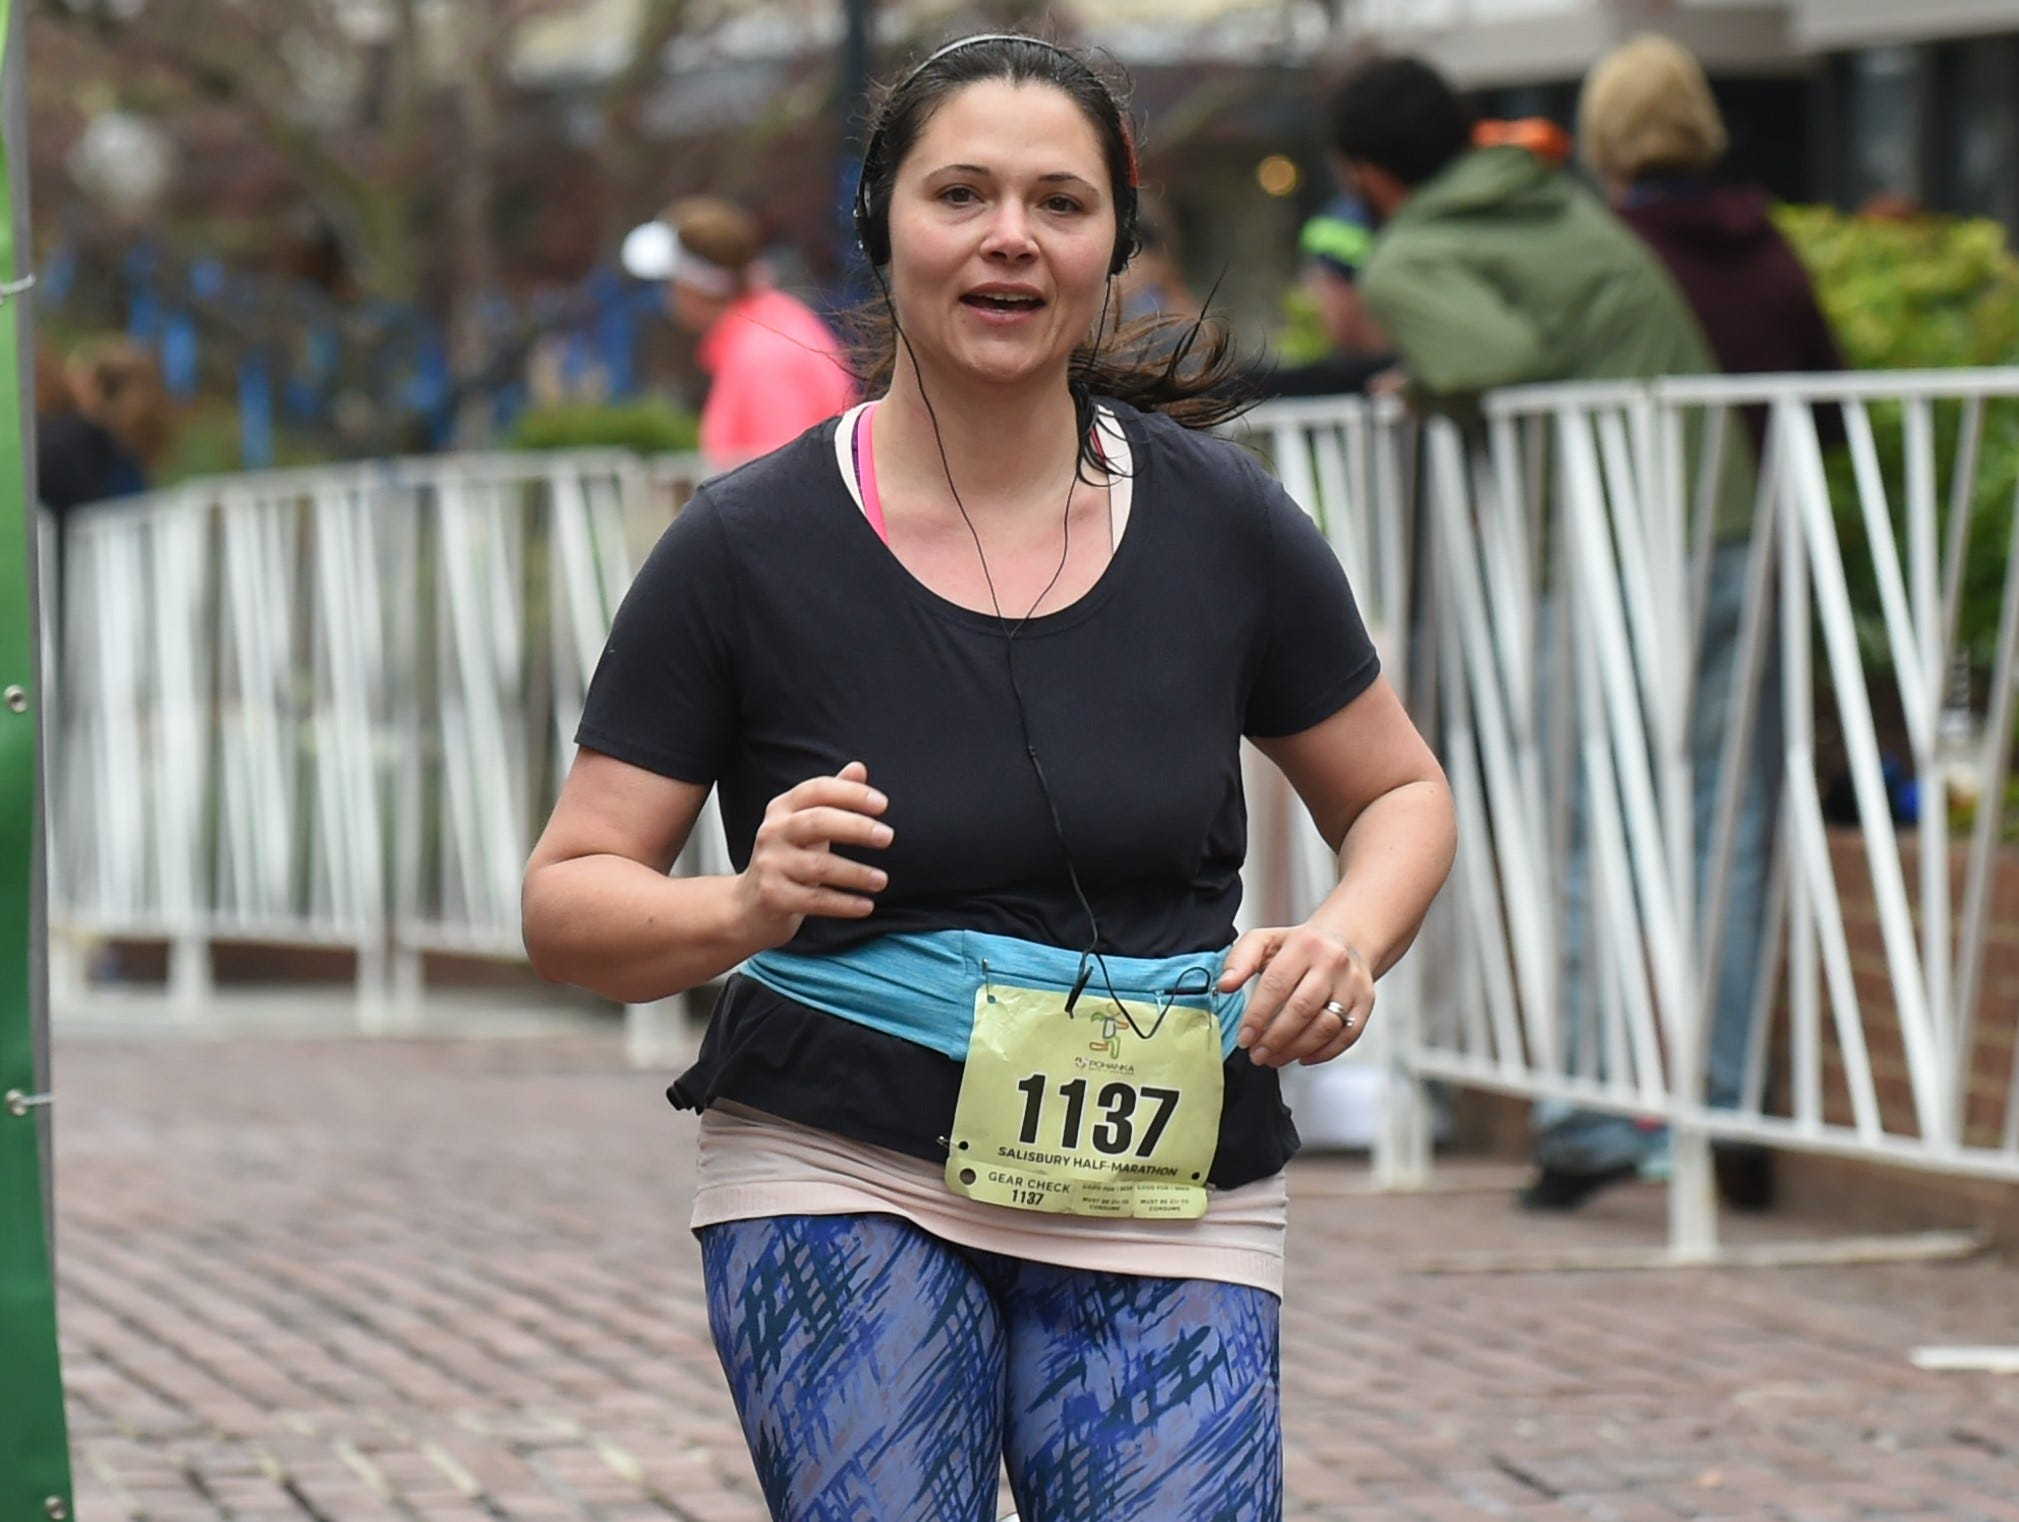 Amanda Ault finishes the half marathon at the 2nd Salisbury Marathon/ Half Marathon/ 5k on Saturday, April 6, 2019.